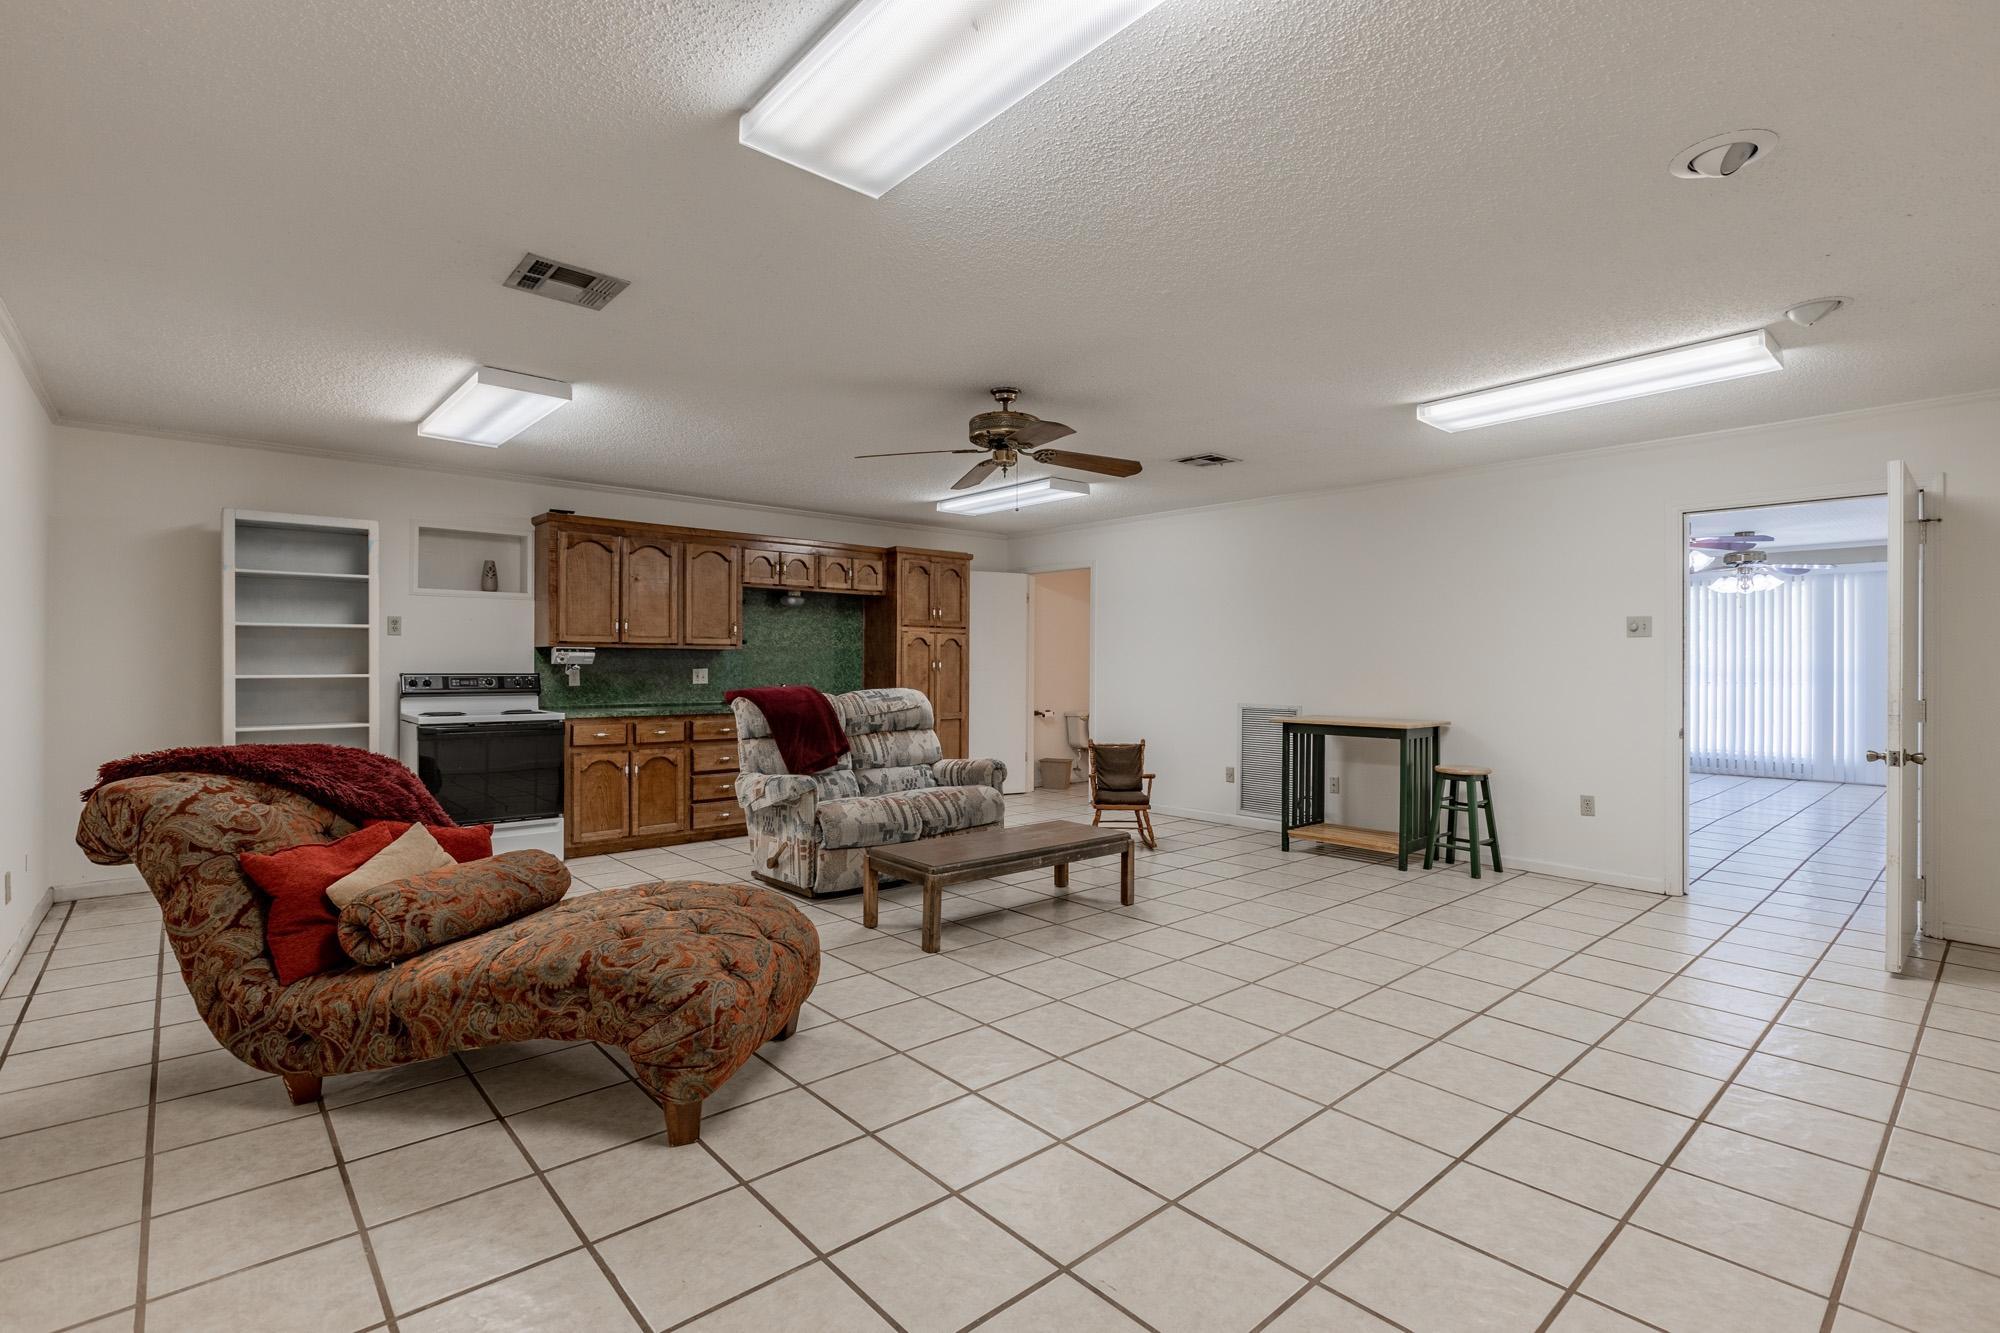 156 Edith Rd, Lafayette, LA 70508